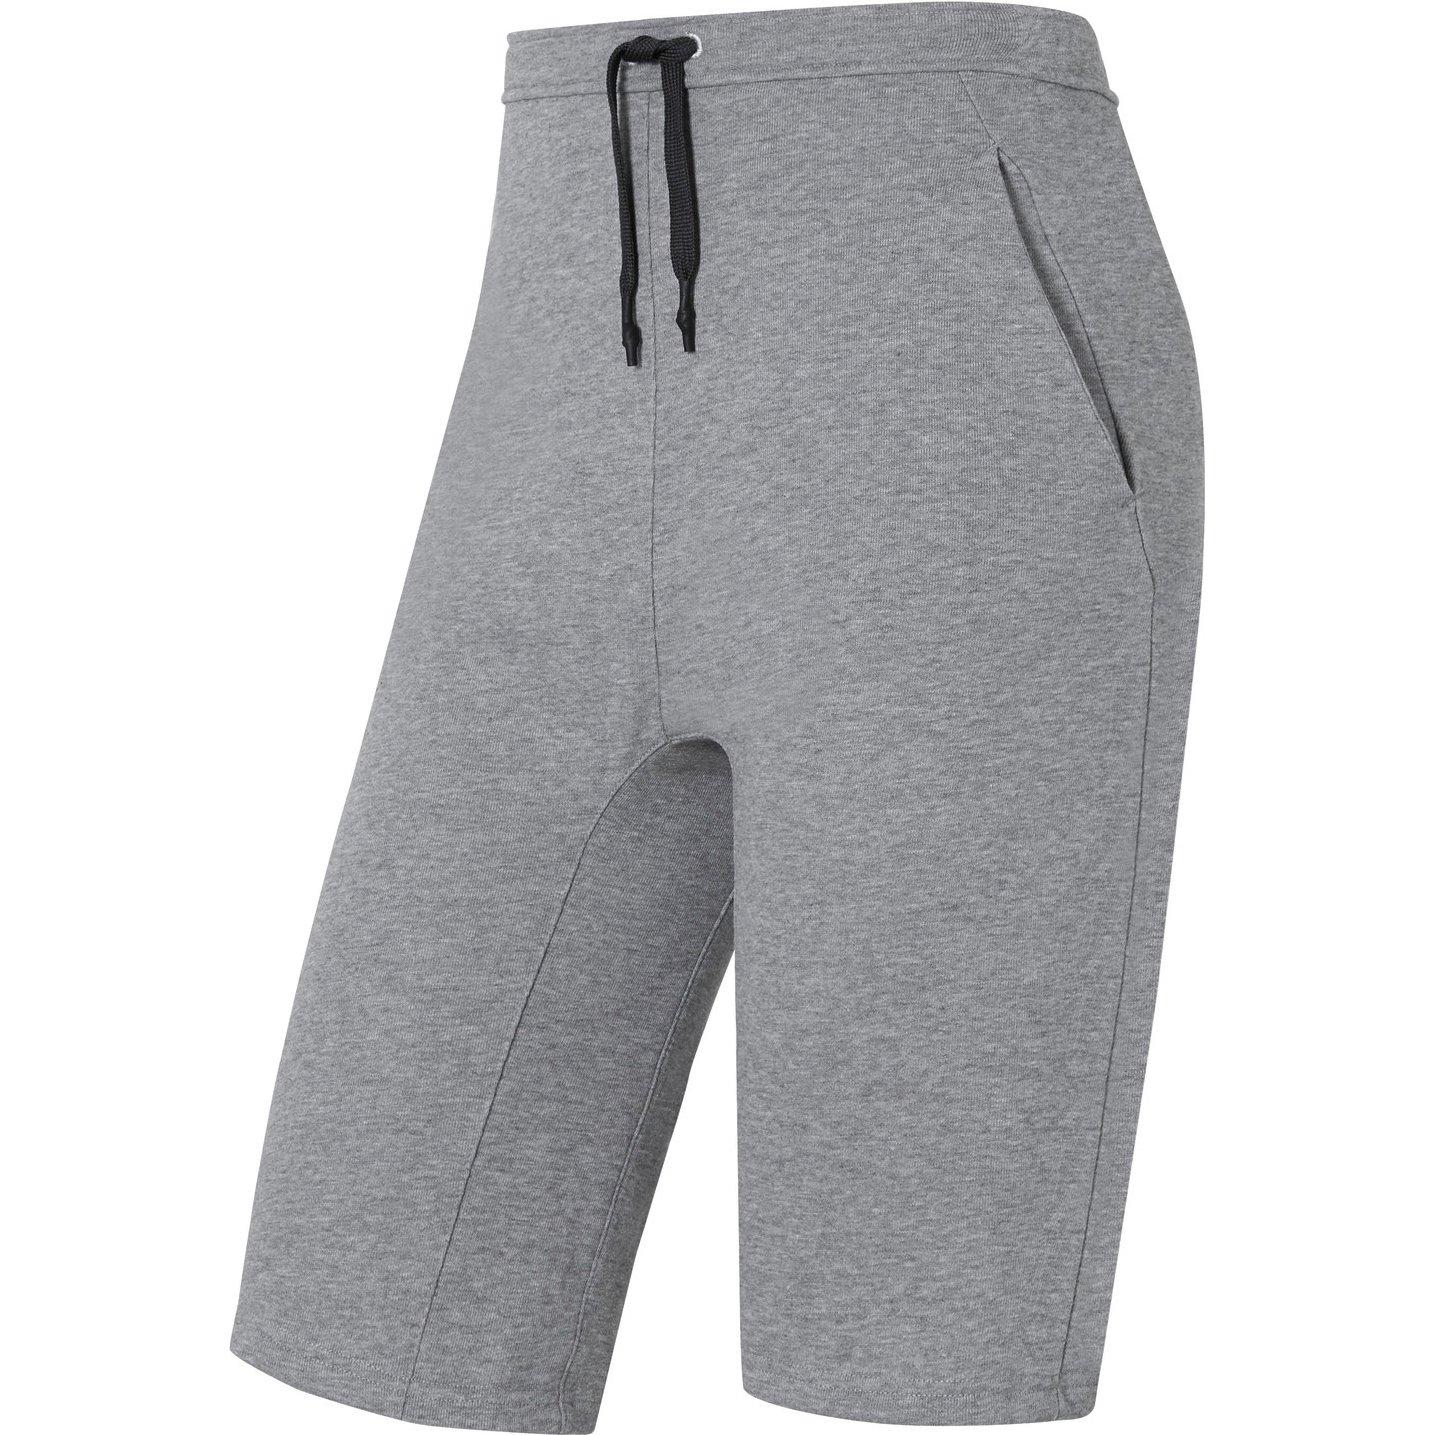 Odlo Herren Spot Shorts Oberbekleidung